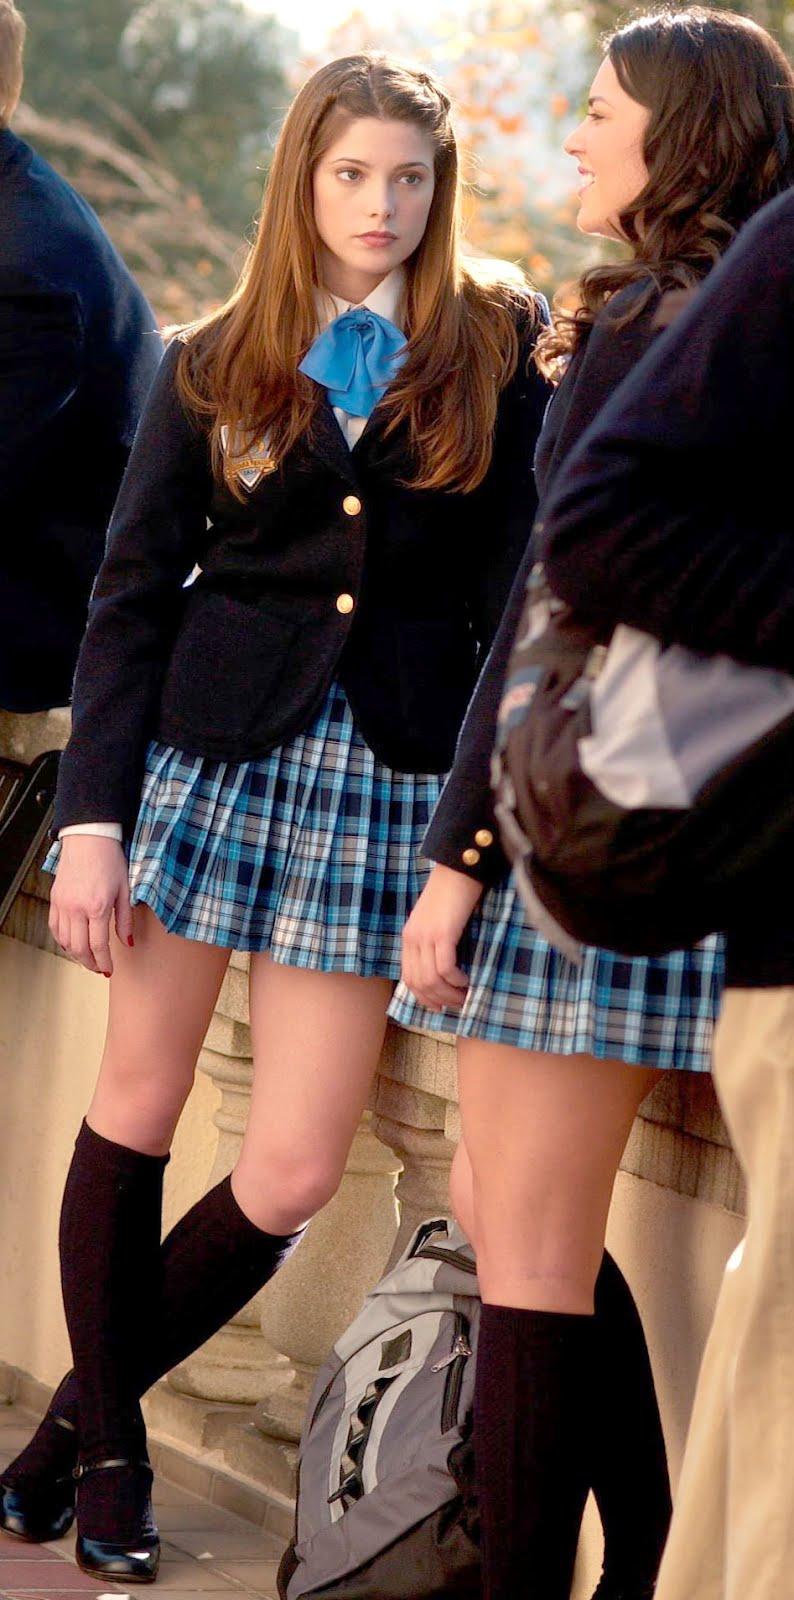 Anime Schoolgirl Upskirt first day of school: school girl love